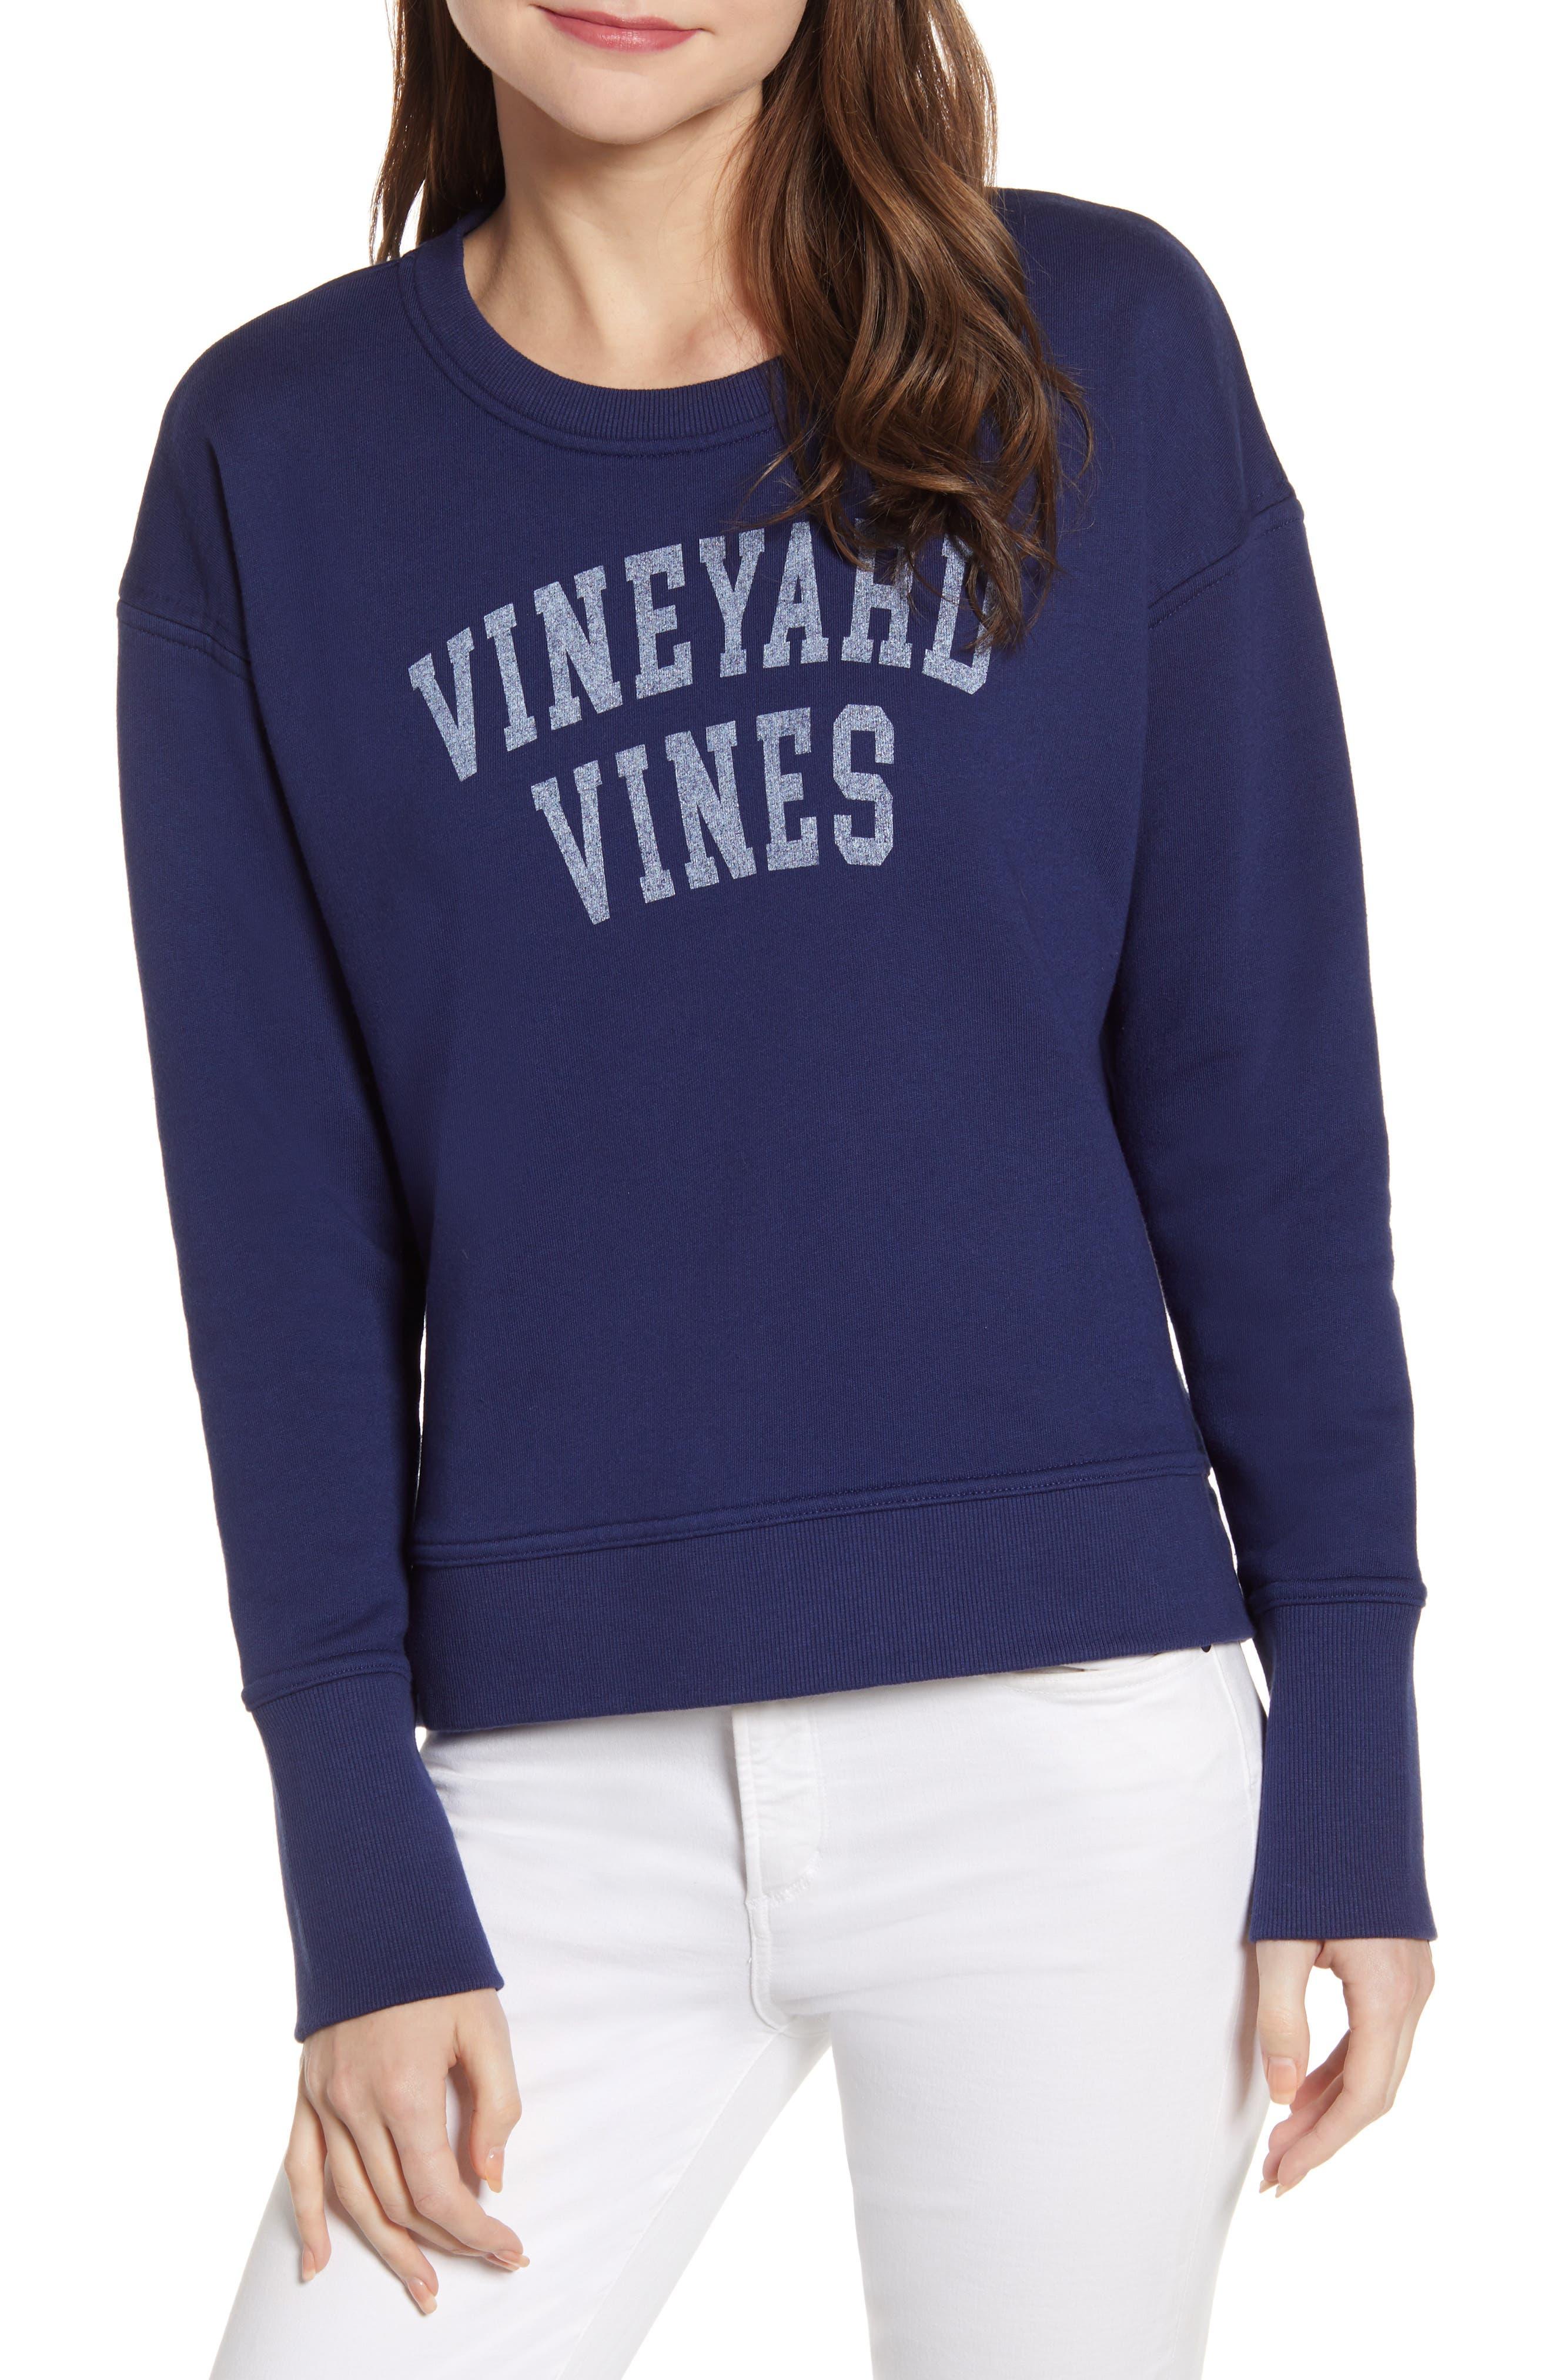 Vineyard Vines Logo Cotton Blend Sweatshirt, Blue